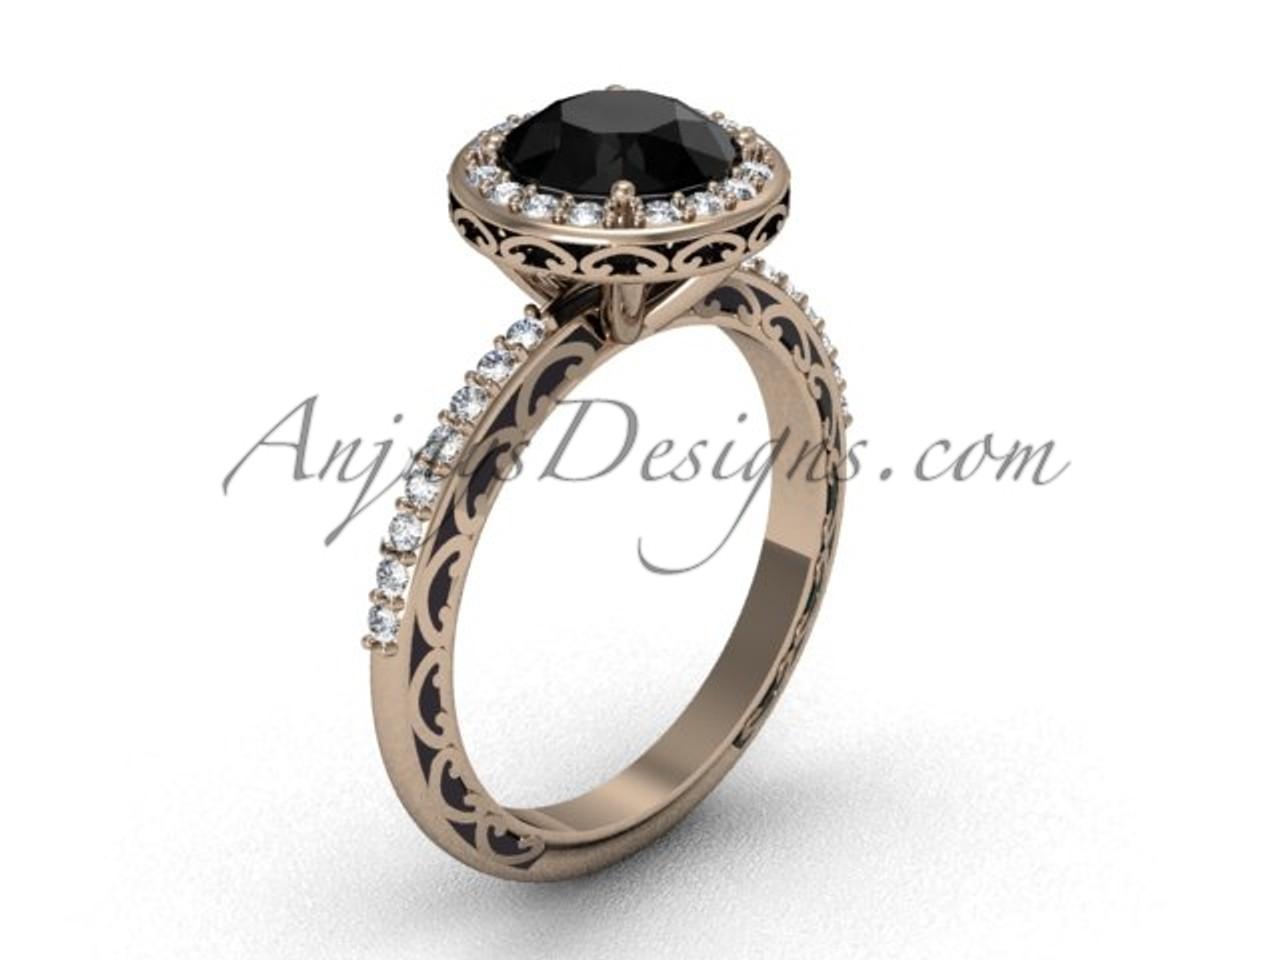 Unique Wedding Ring.Unique Engagement Rings 14k Rose Gold Dream Black Diamond Solitaire Bridal Ring Sgt625